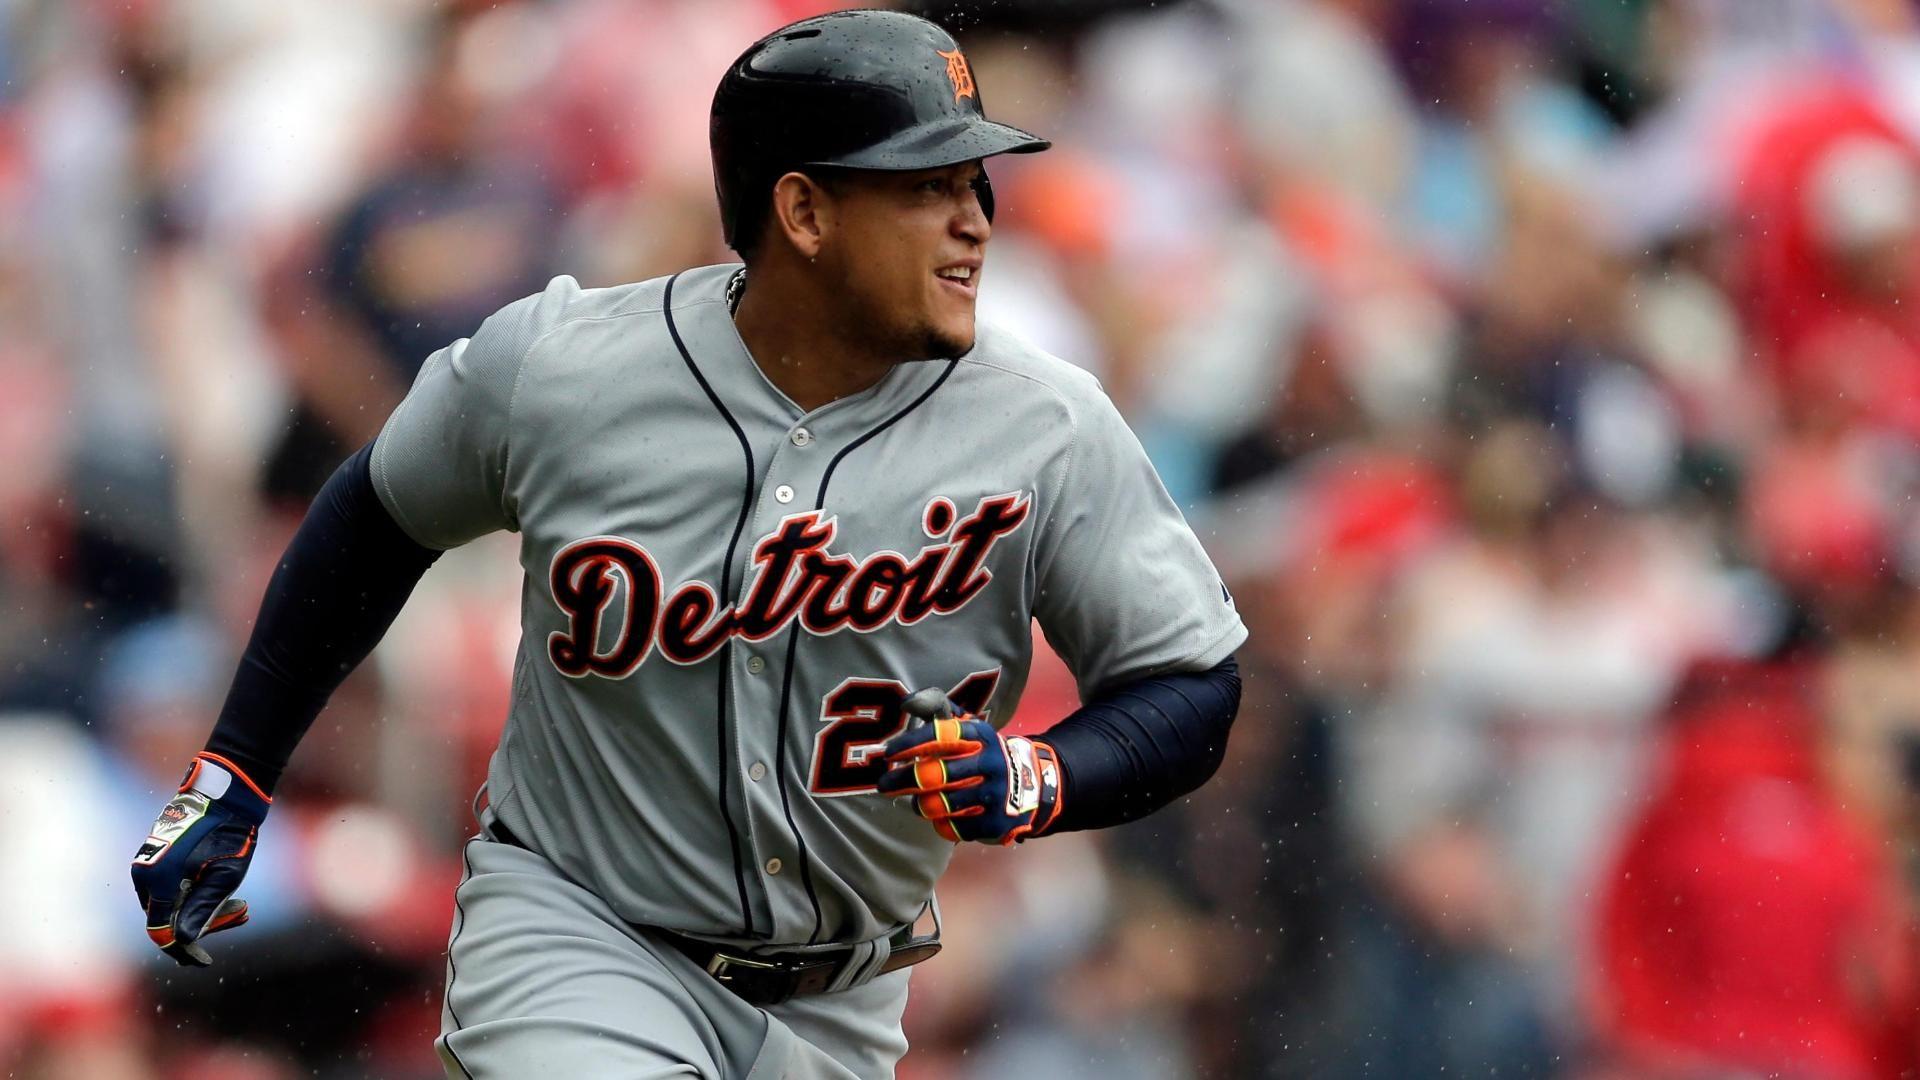 Cabrera blasts 400th HR in Tigers' victory